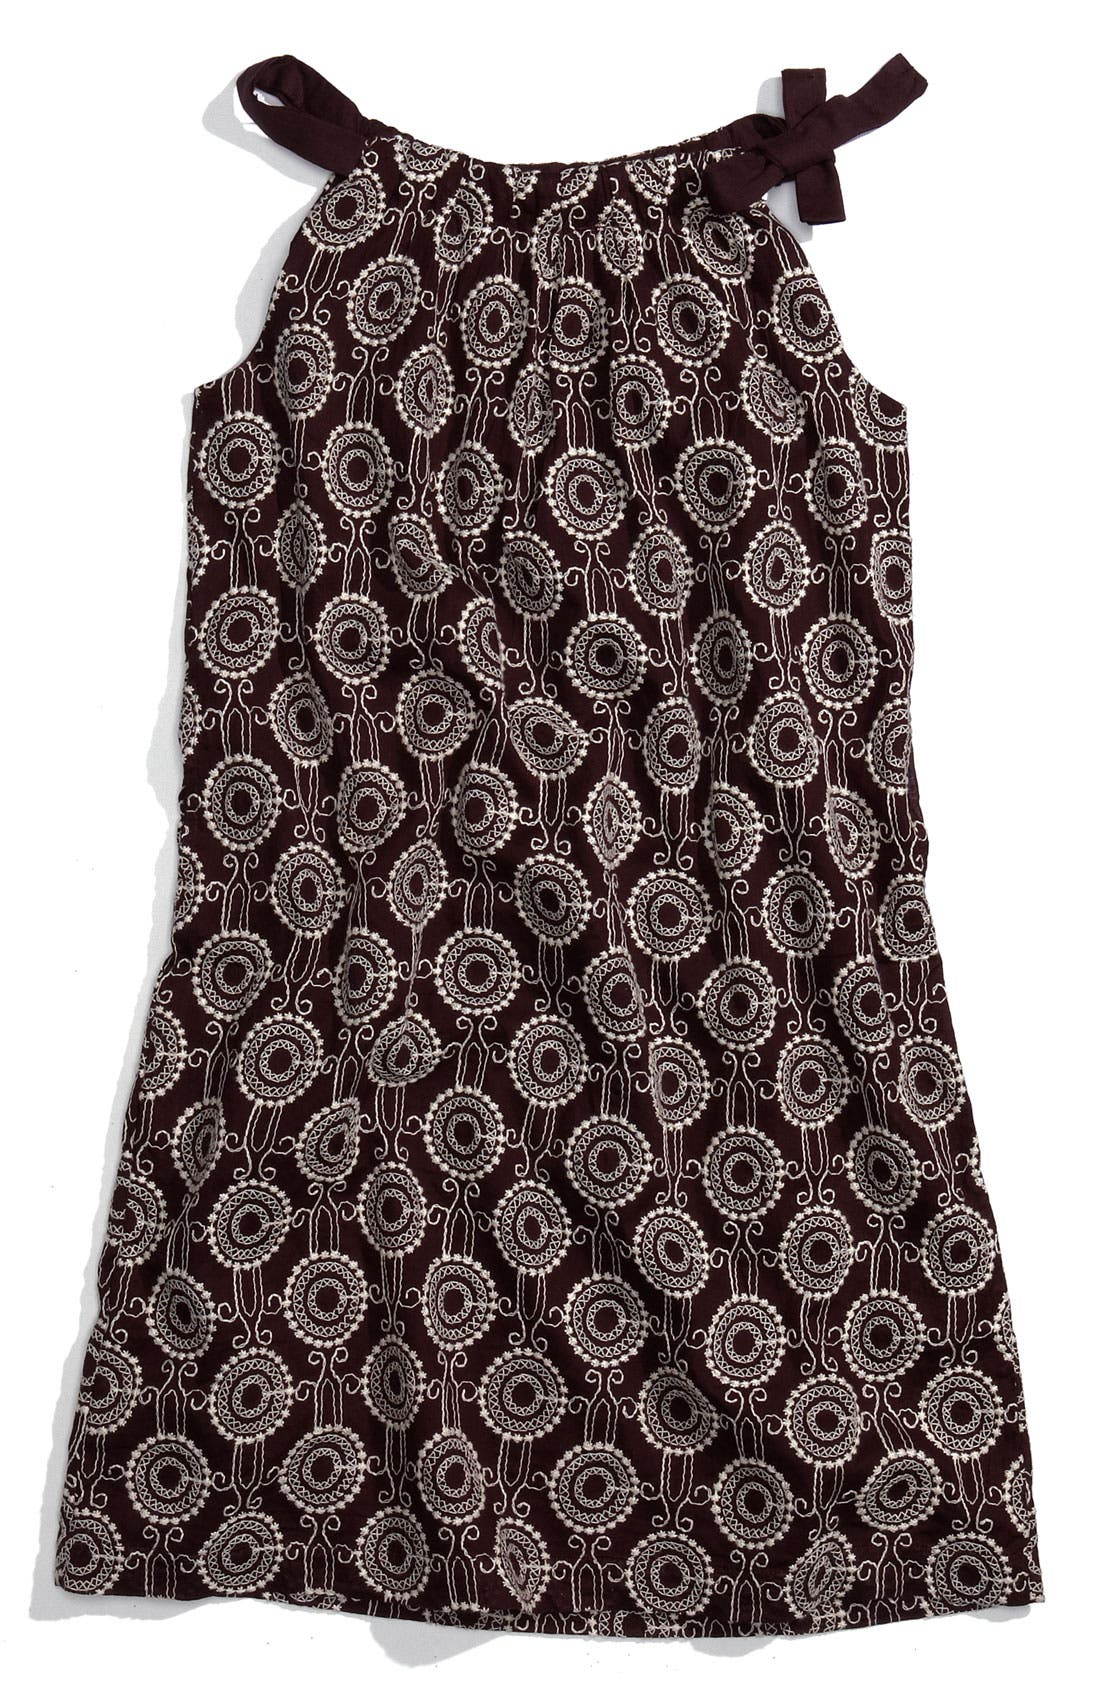 Main Image - Peek Embroidered Dress (Toddler, Little Girl & Big Girl)